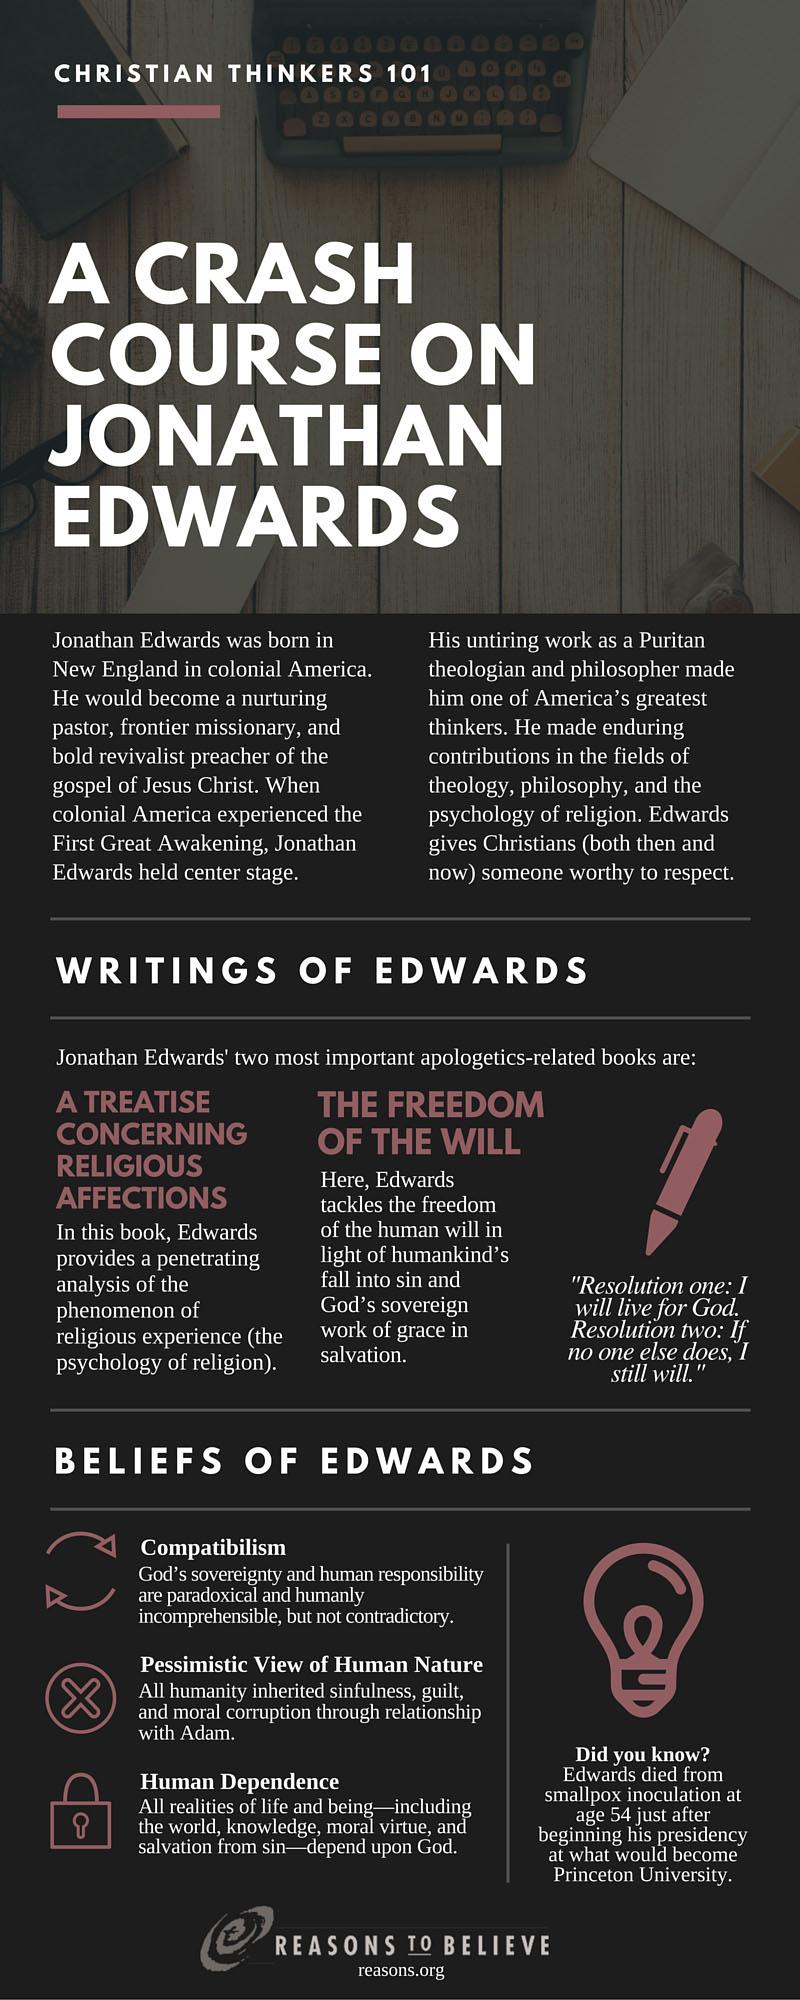 Christian Thinkers 101: A Crash Course on Jonathan Edwards